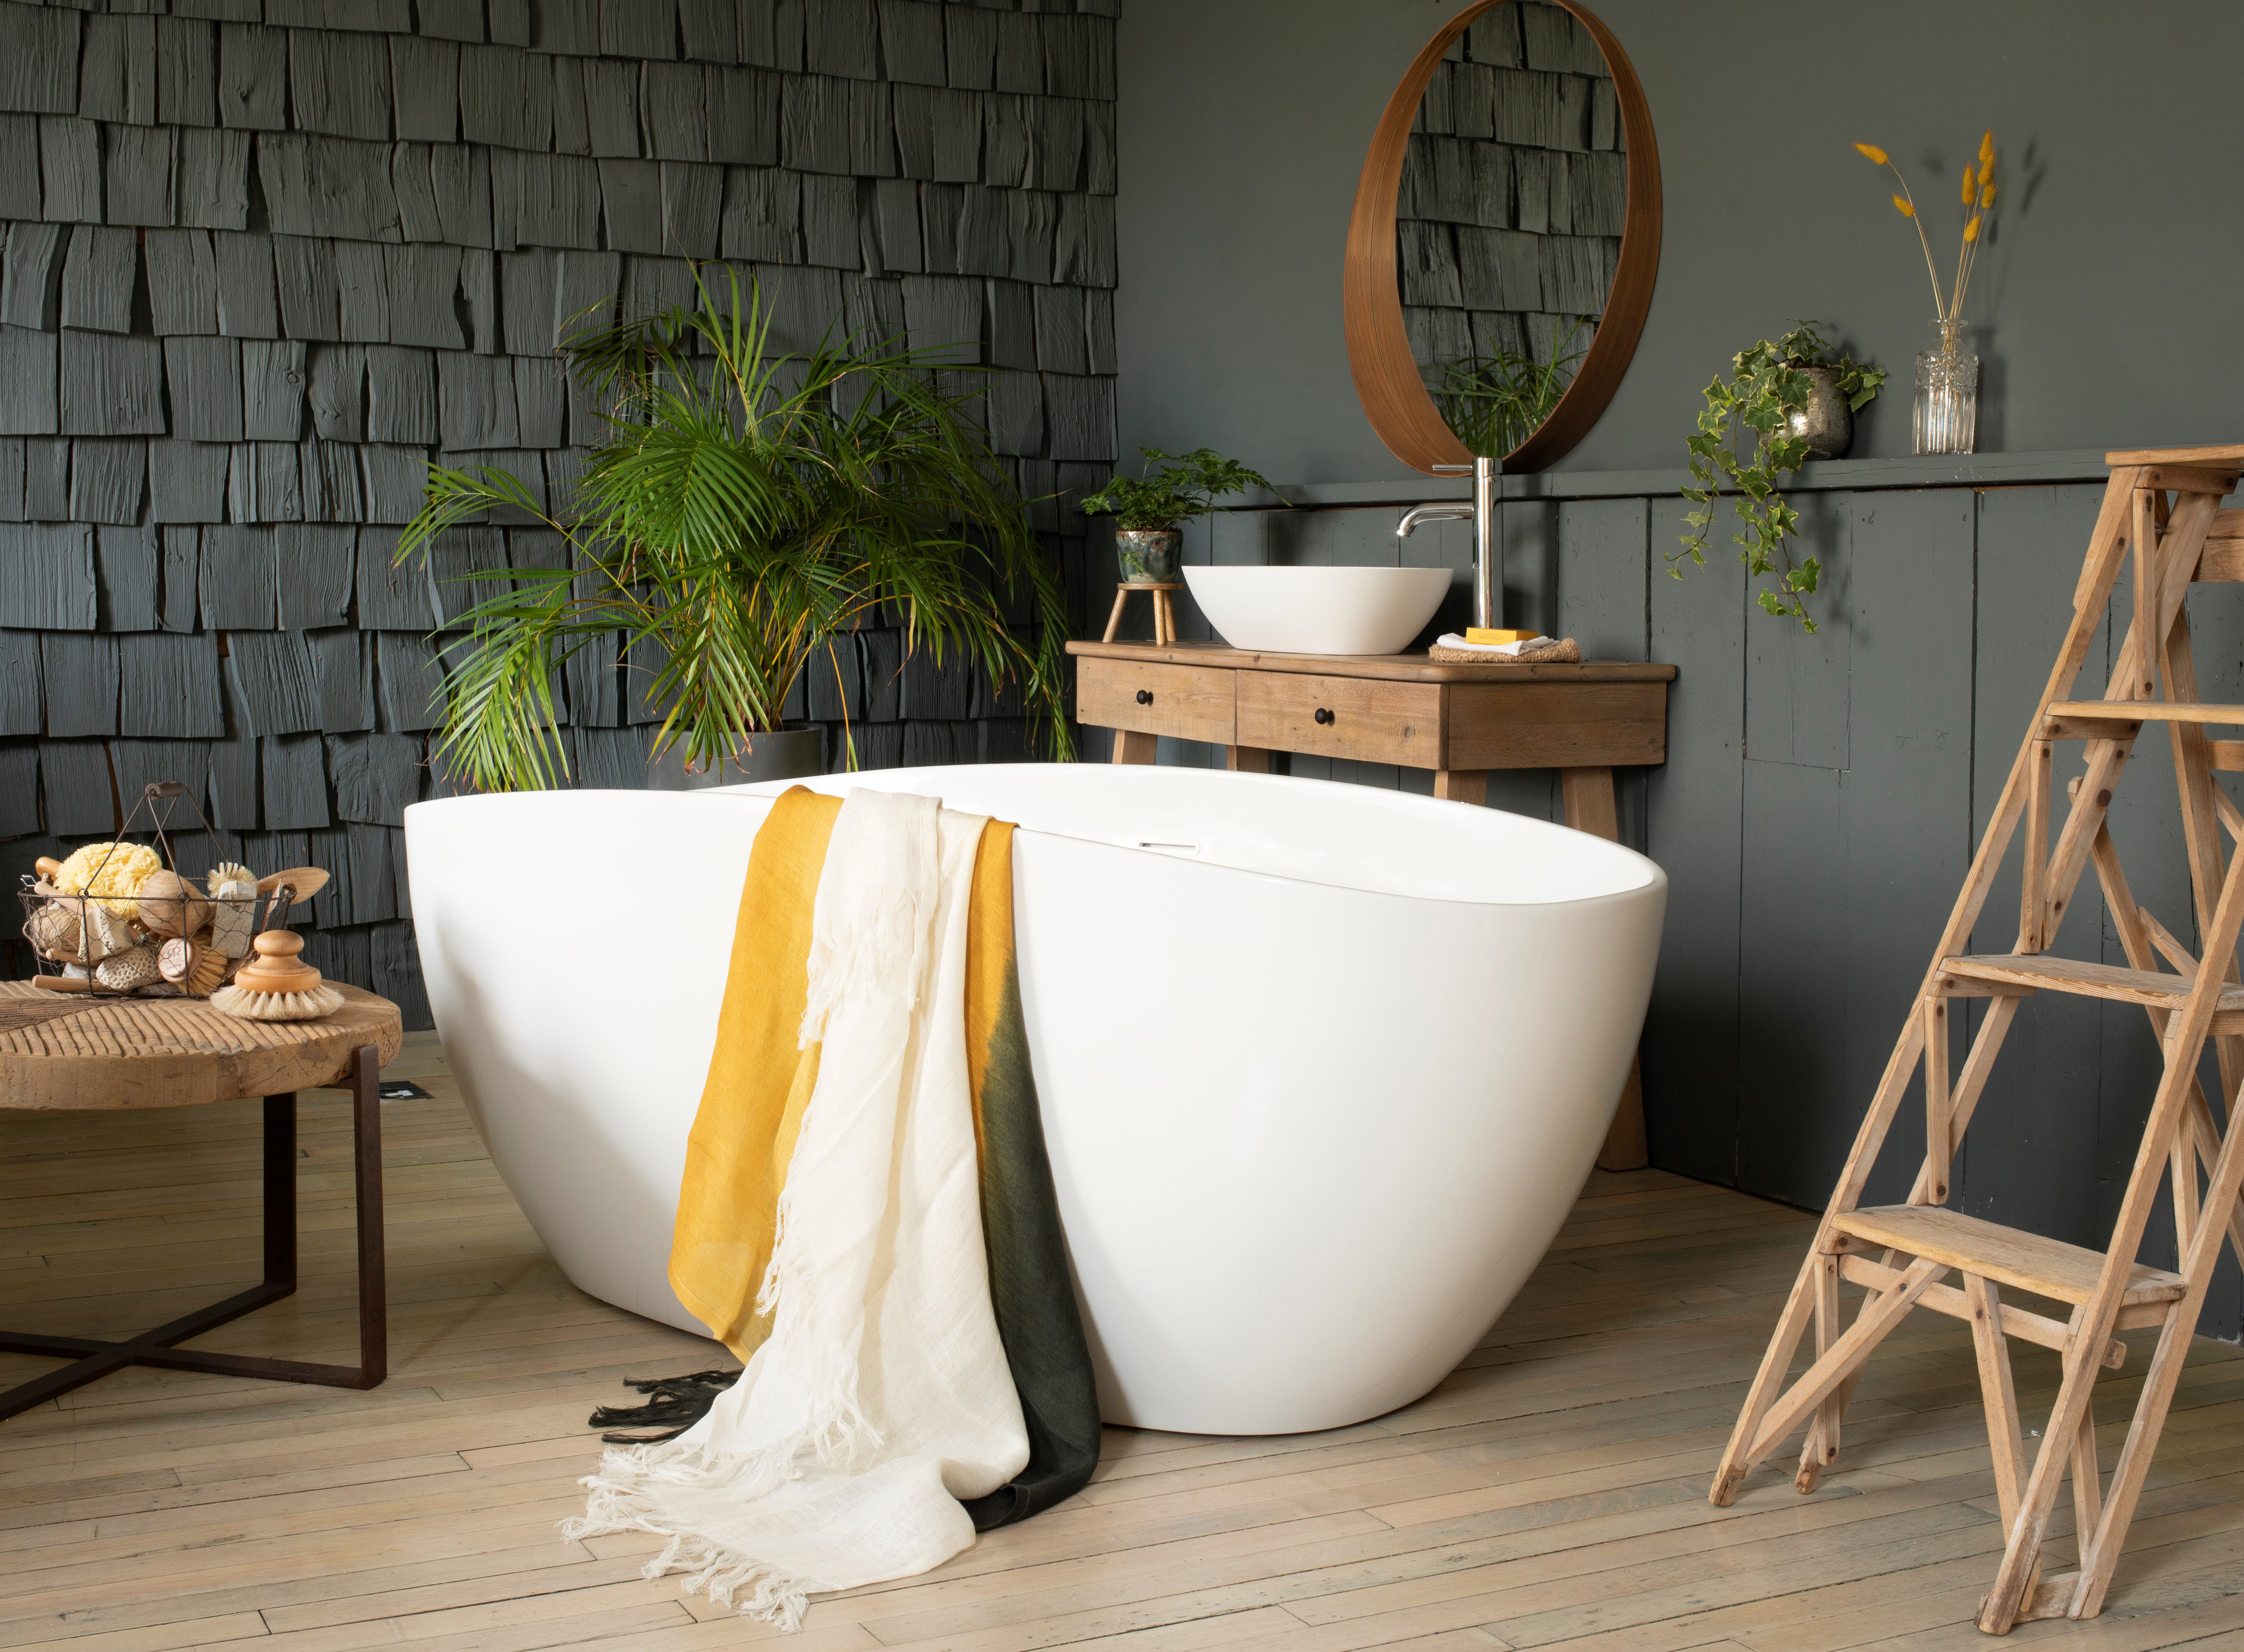 Luxury bathroom ideas 21 ways to get a luxe master bathroom ...